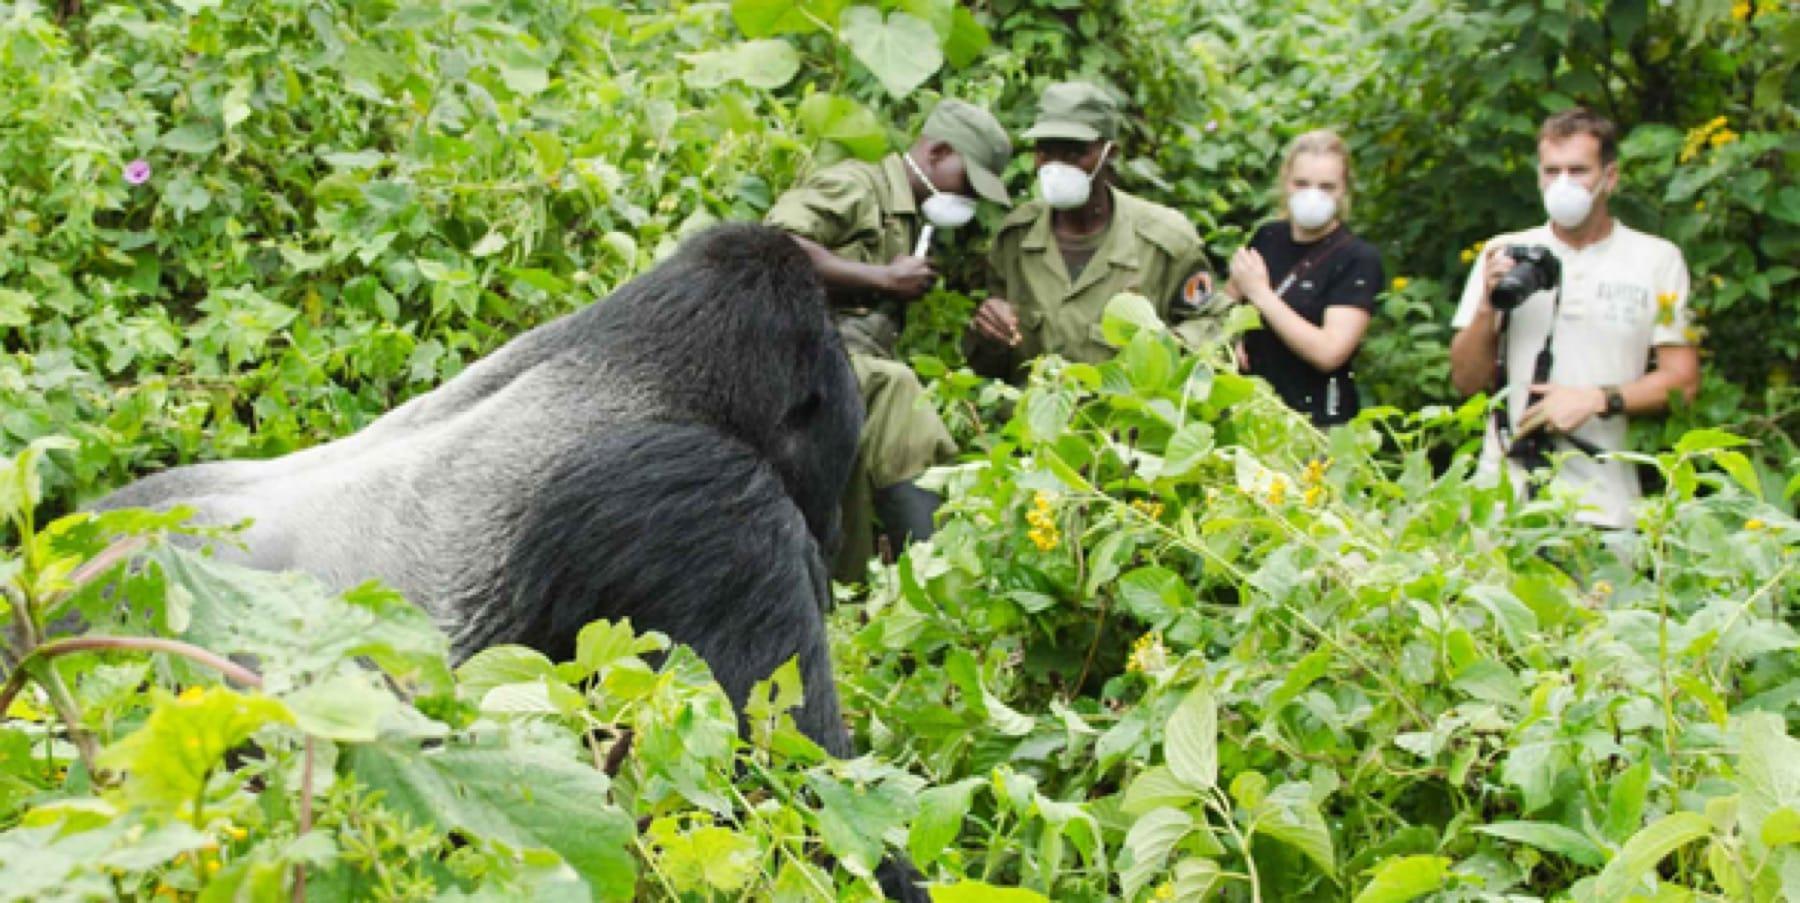 gorilla trekking silverback gorilla